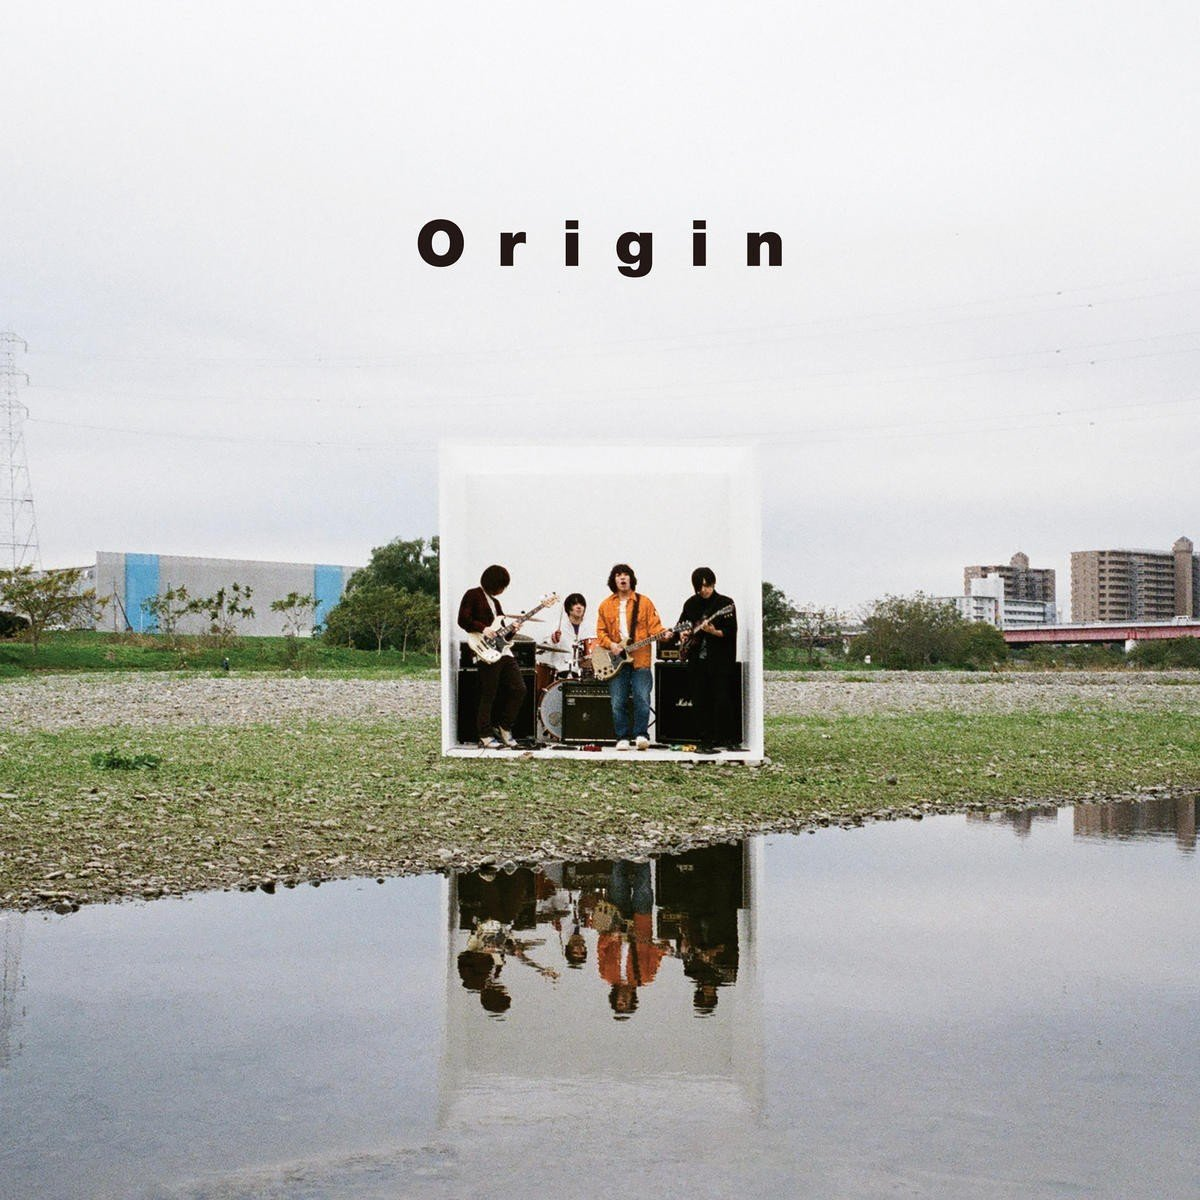 [音楽 – Album] KANA-BOON – Origin [FLAC / 24bit Lossless / WEB] [2016.02.17]